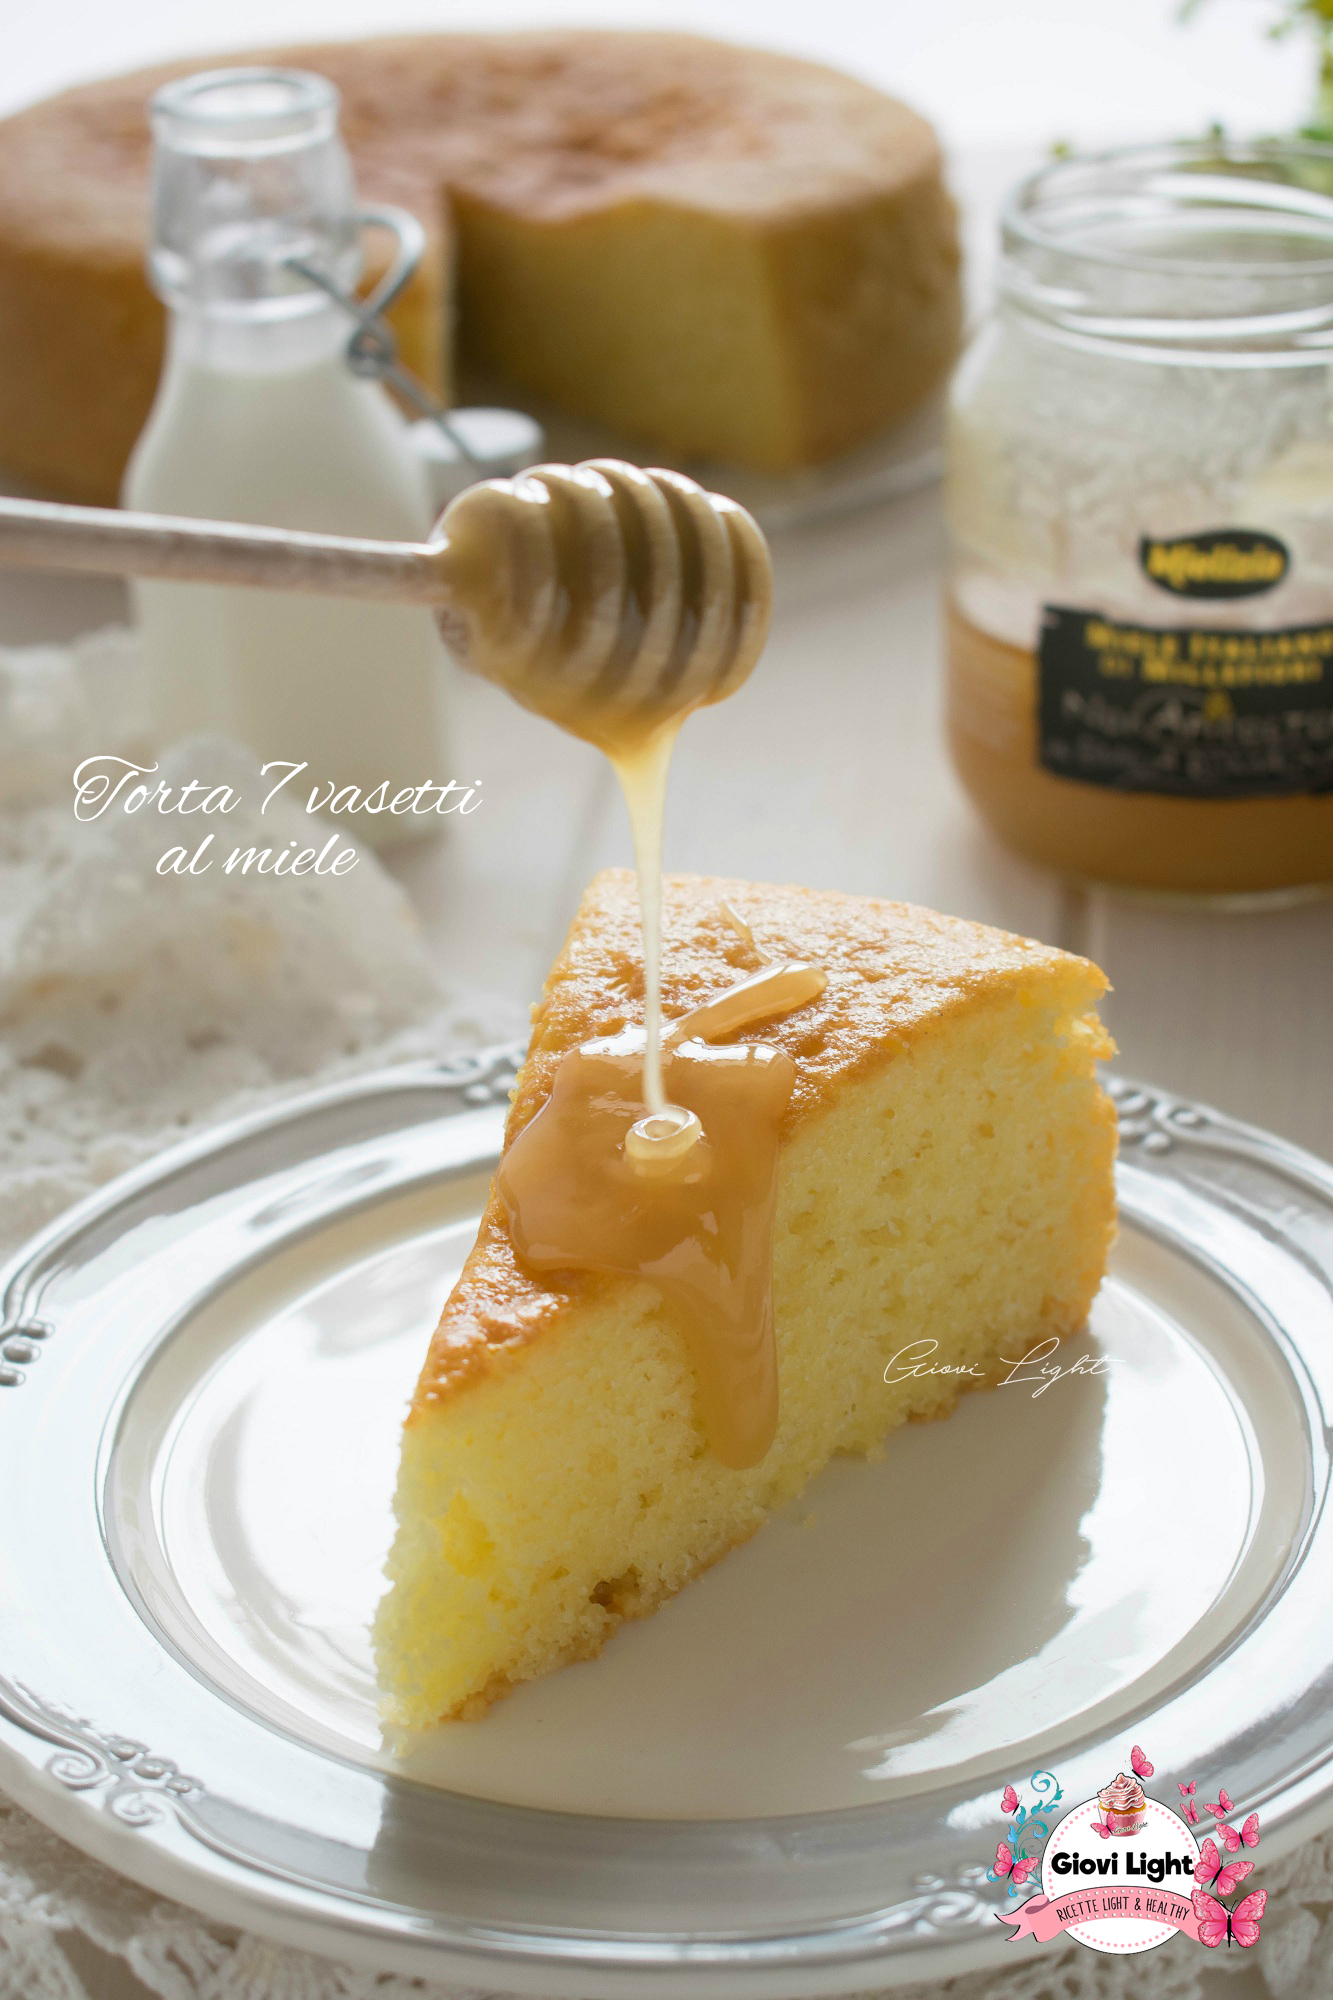 Torta 7 vasetti al miele